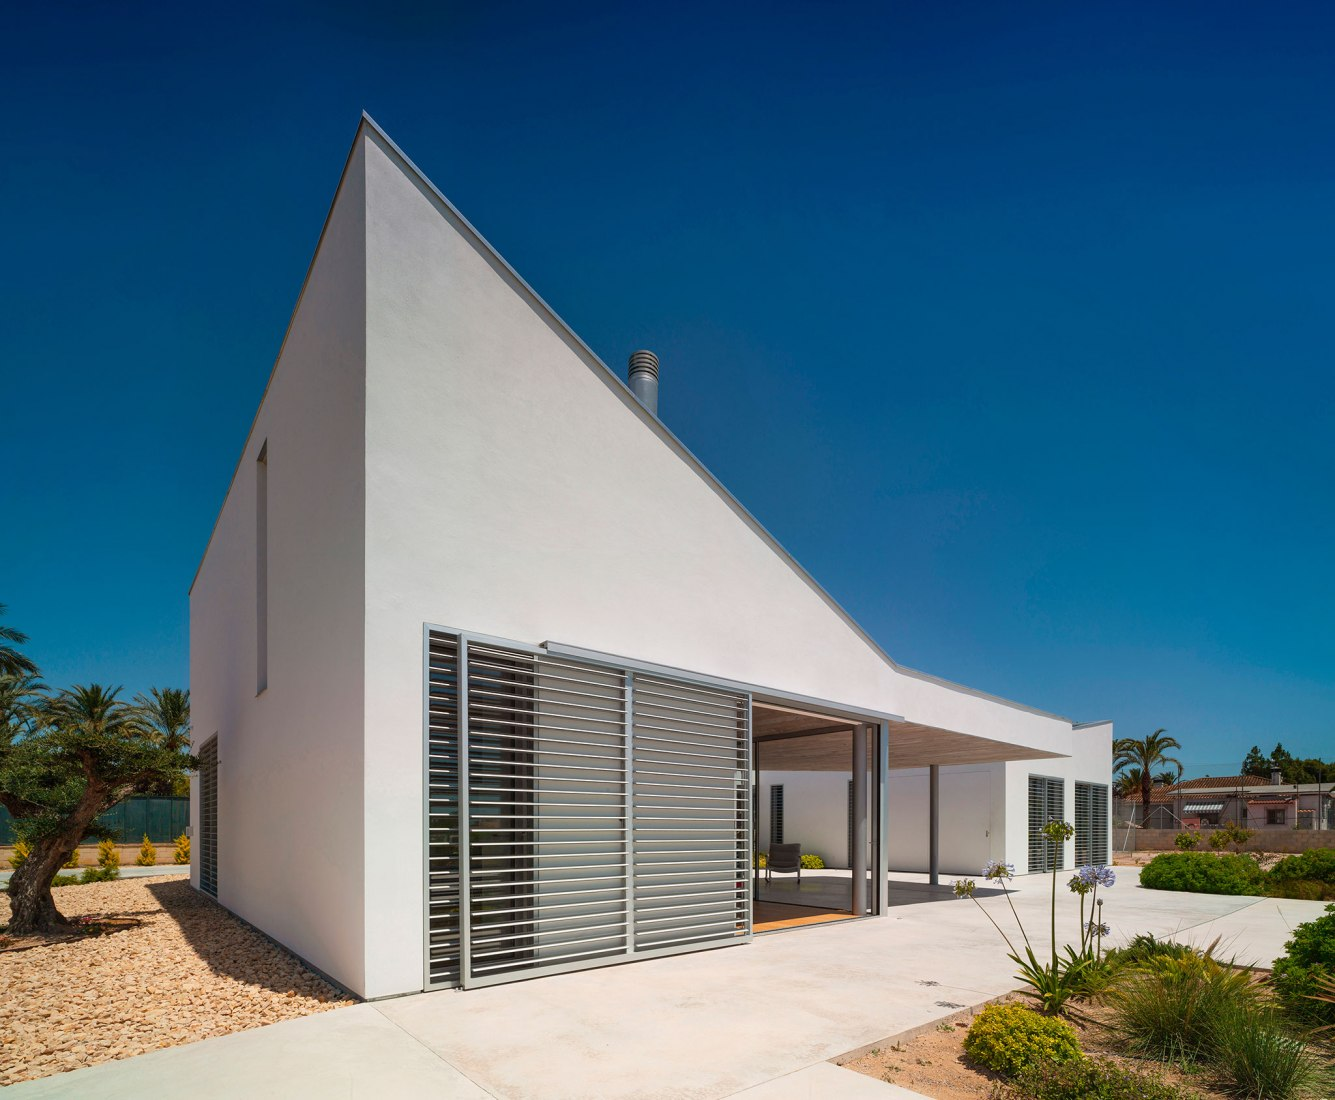 Patioporche House by Jaime Sepulcre Arquitecturas. Photograph by David Frutos Ruiz